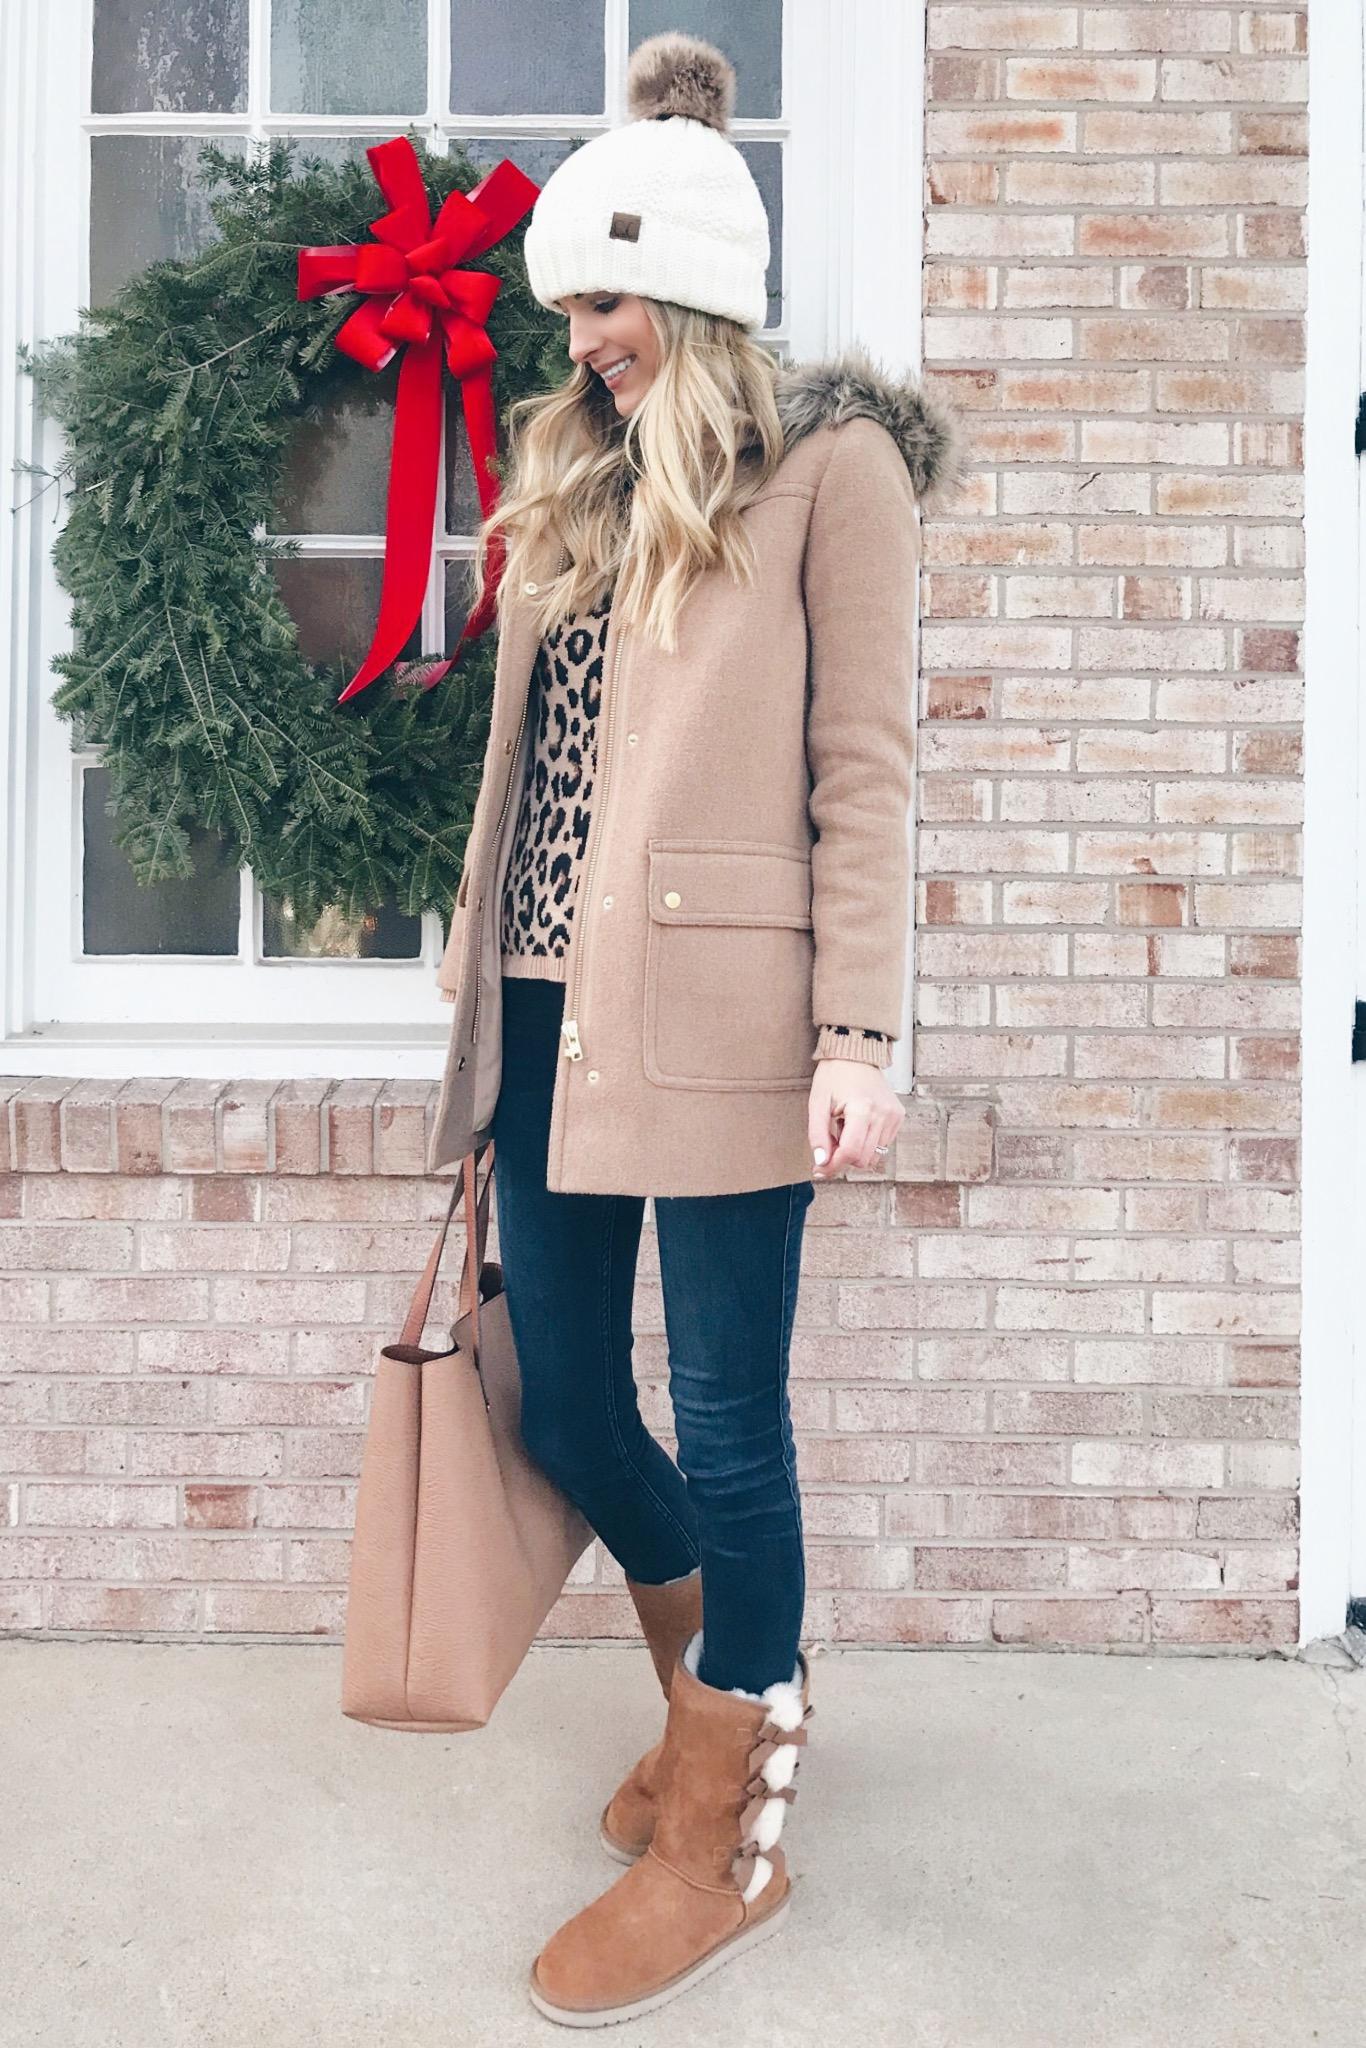 women's boots with bows x koolaburra on pinteresting plans connecticut fashion blog